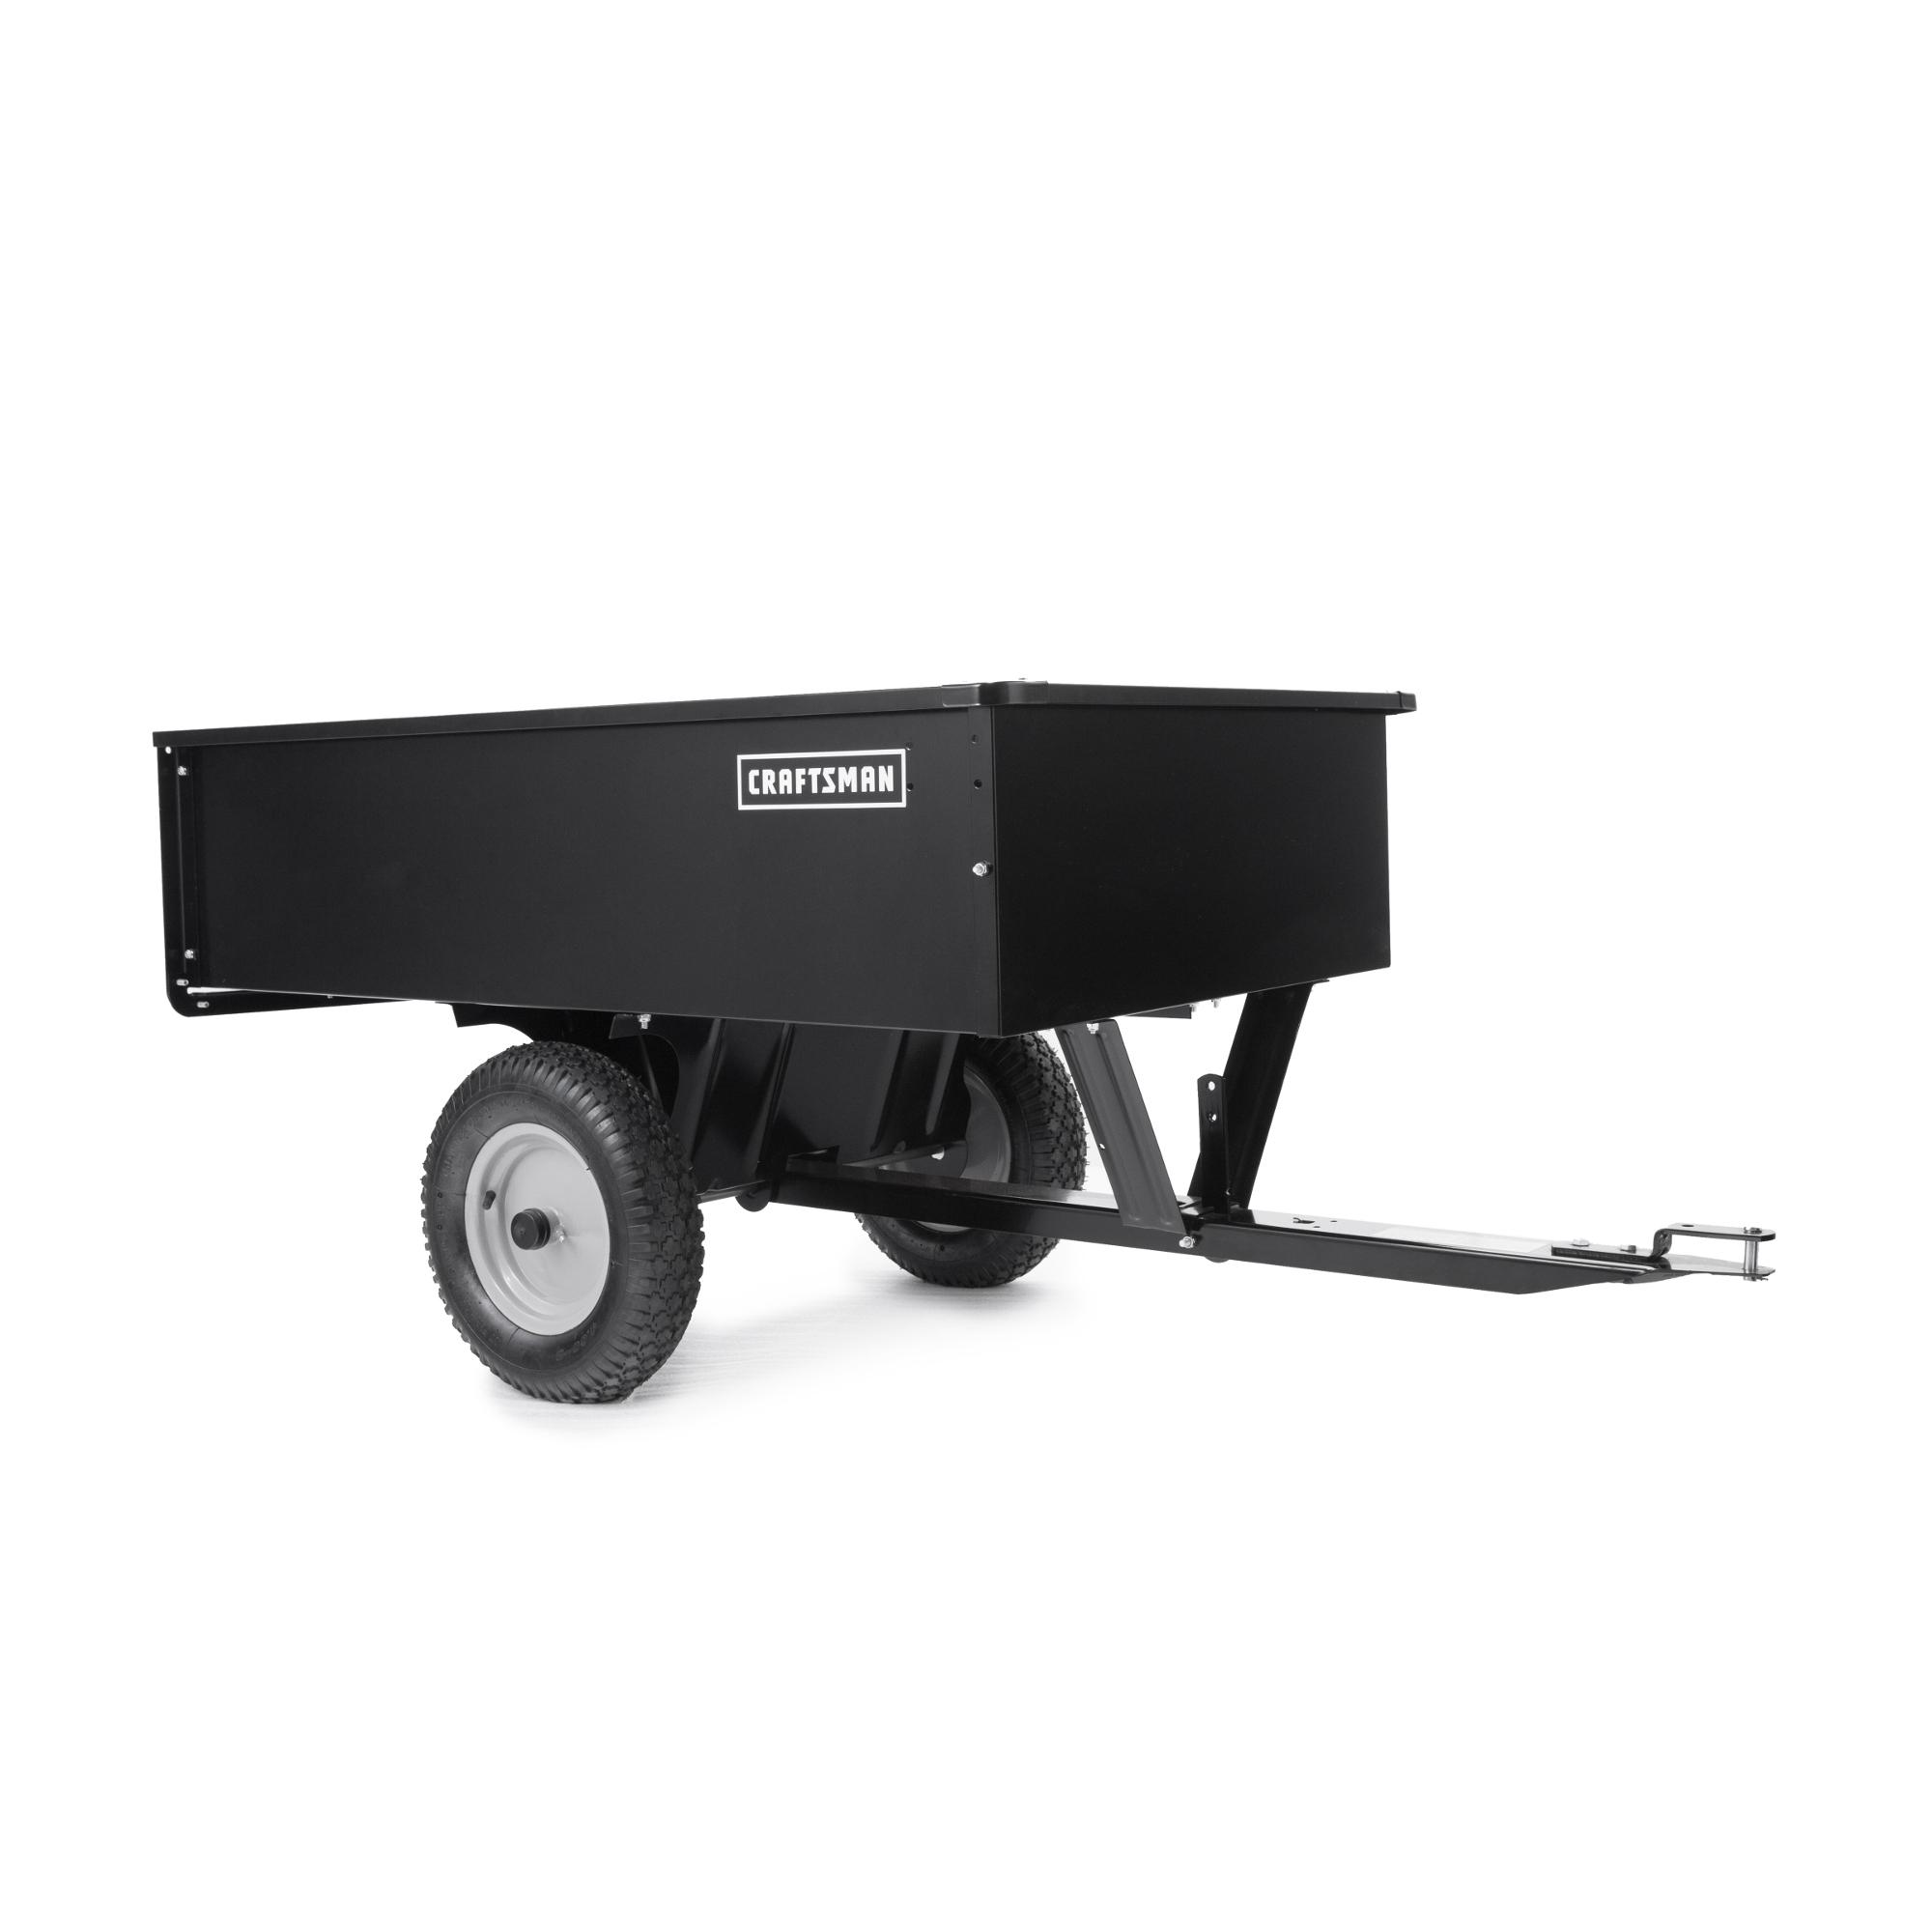 Craftsman 12 cu. ft. Steel Dump Cart